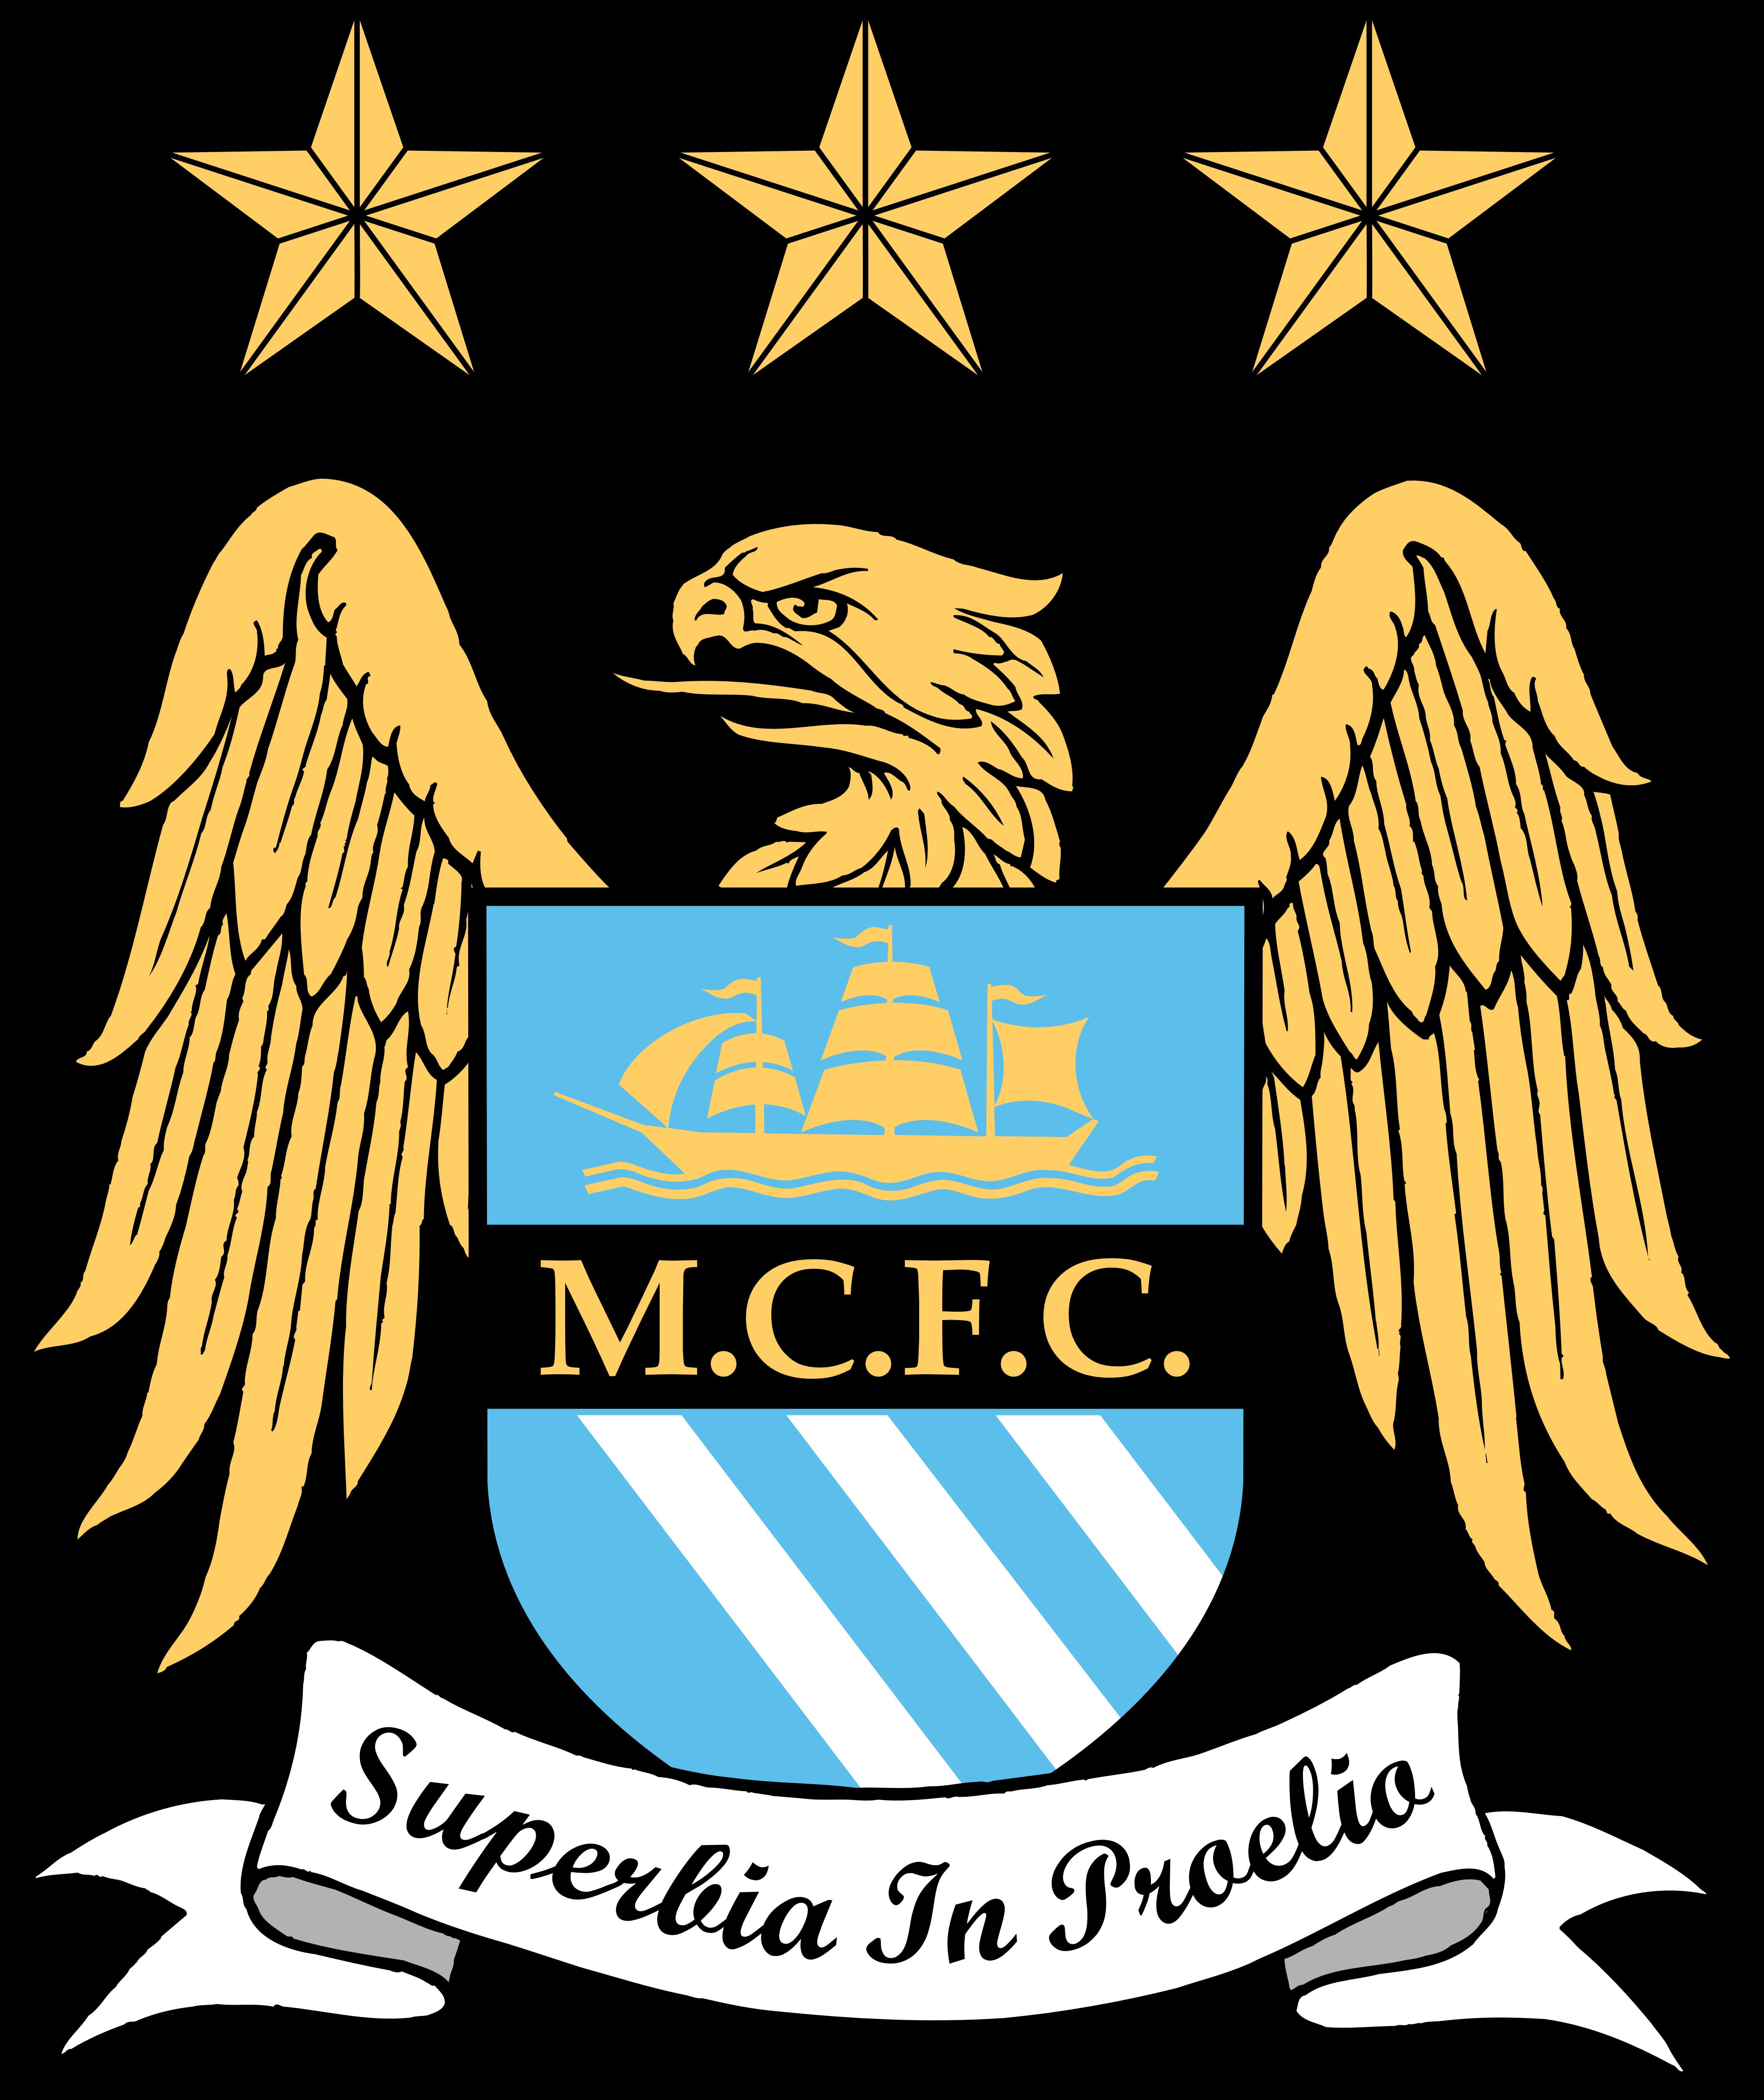 Manchester city new logo clipart jpg free stock Manchester City FC – Logos Download jpg free stock